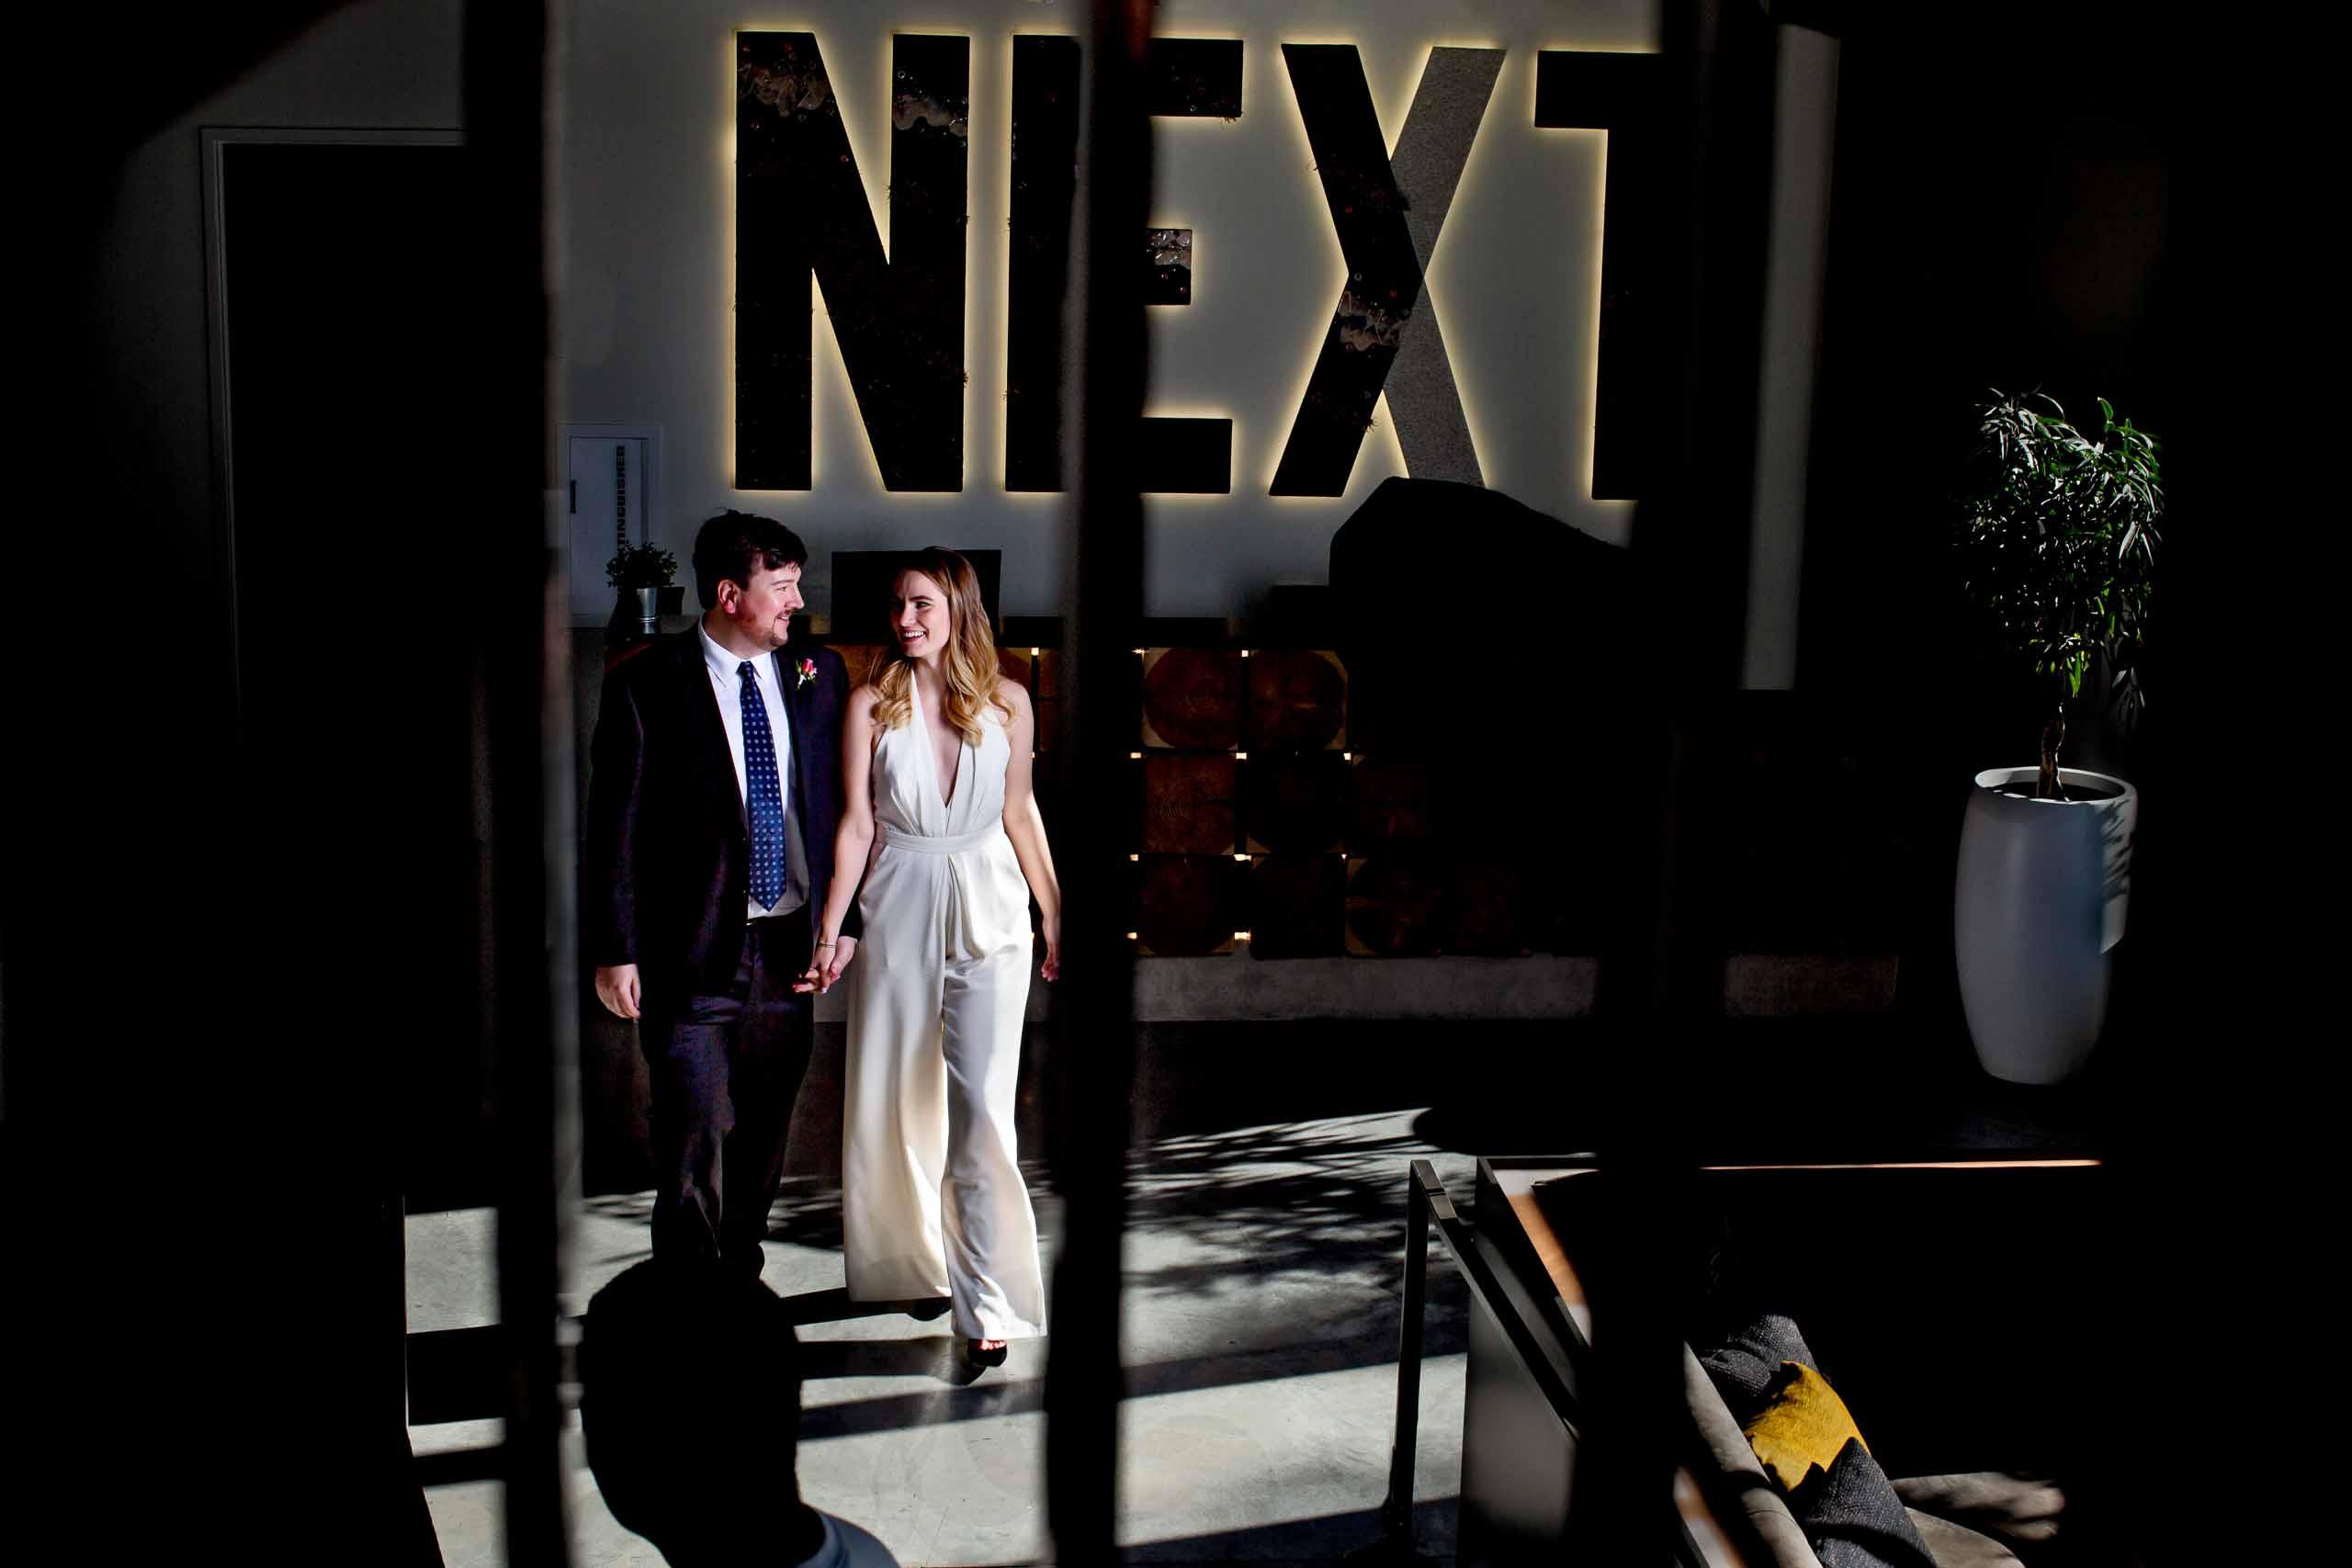 Bride and groom walking together before their Jupiter Next wedding